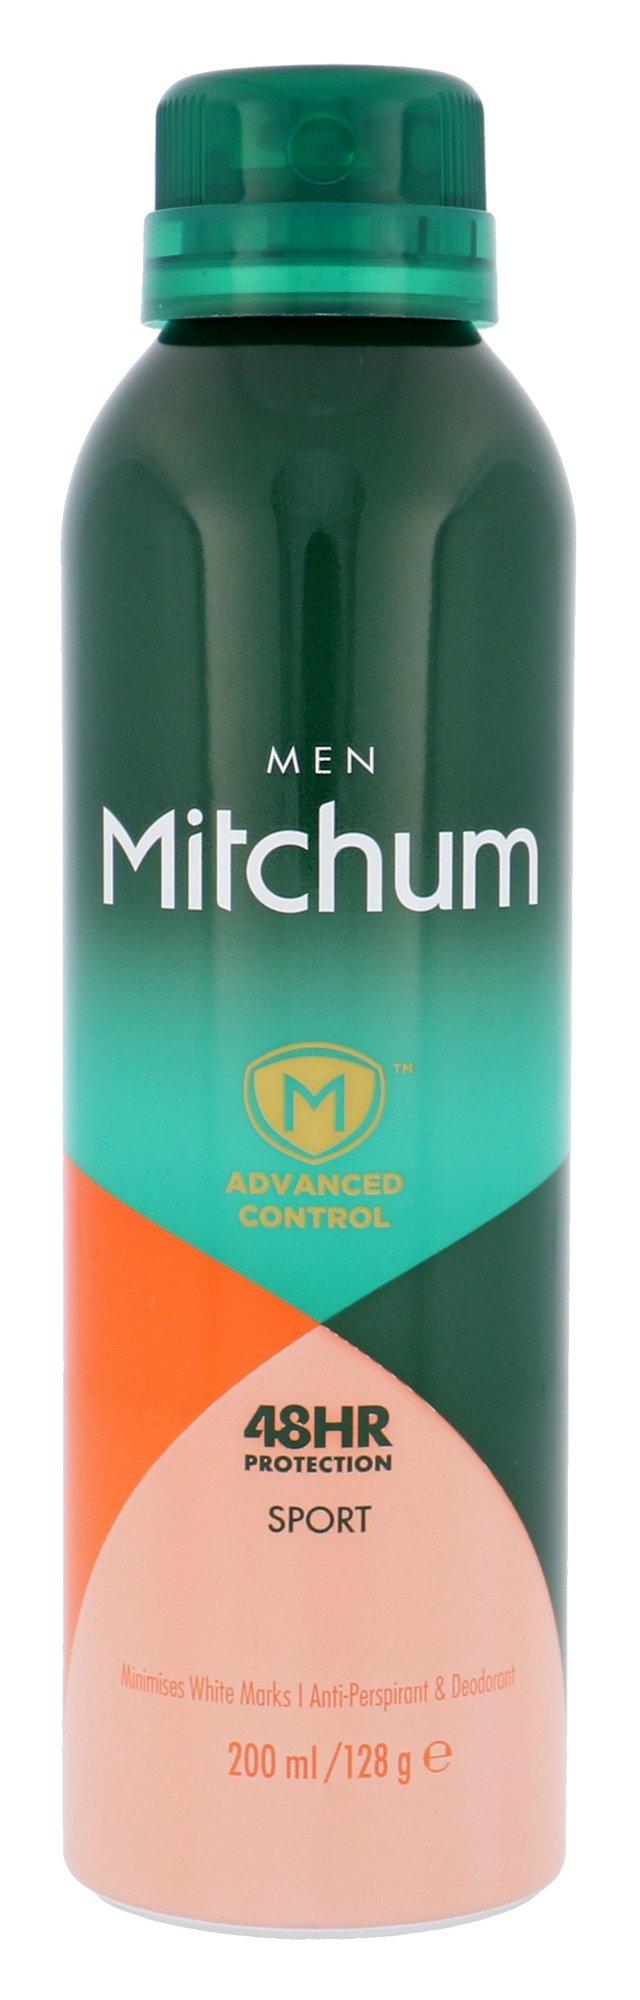 Mitchum Sport Anti-Perspirant Deo Spray 48HR Cosmetic 200ml